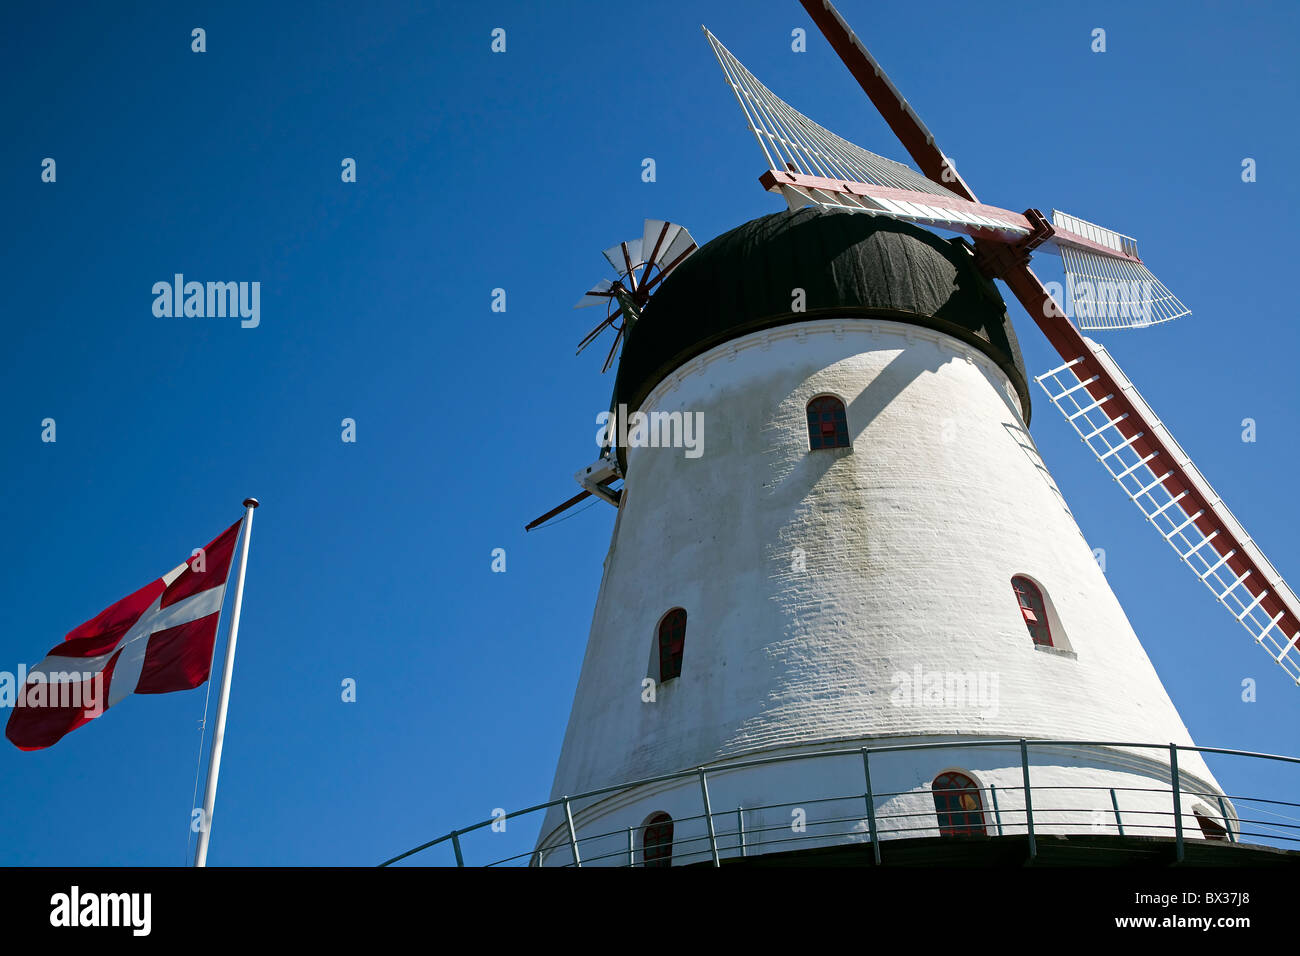 Gudhjem Old Windmill. Gudhjem, Bornholm, Denmark. - Stock Image